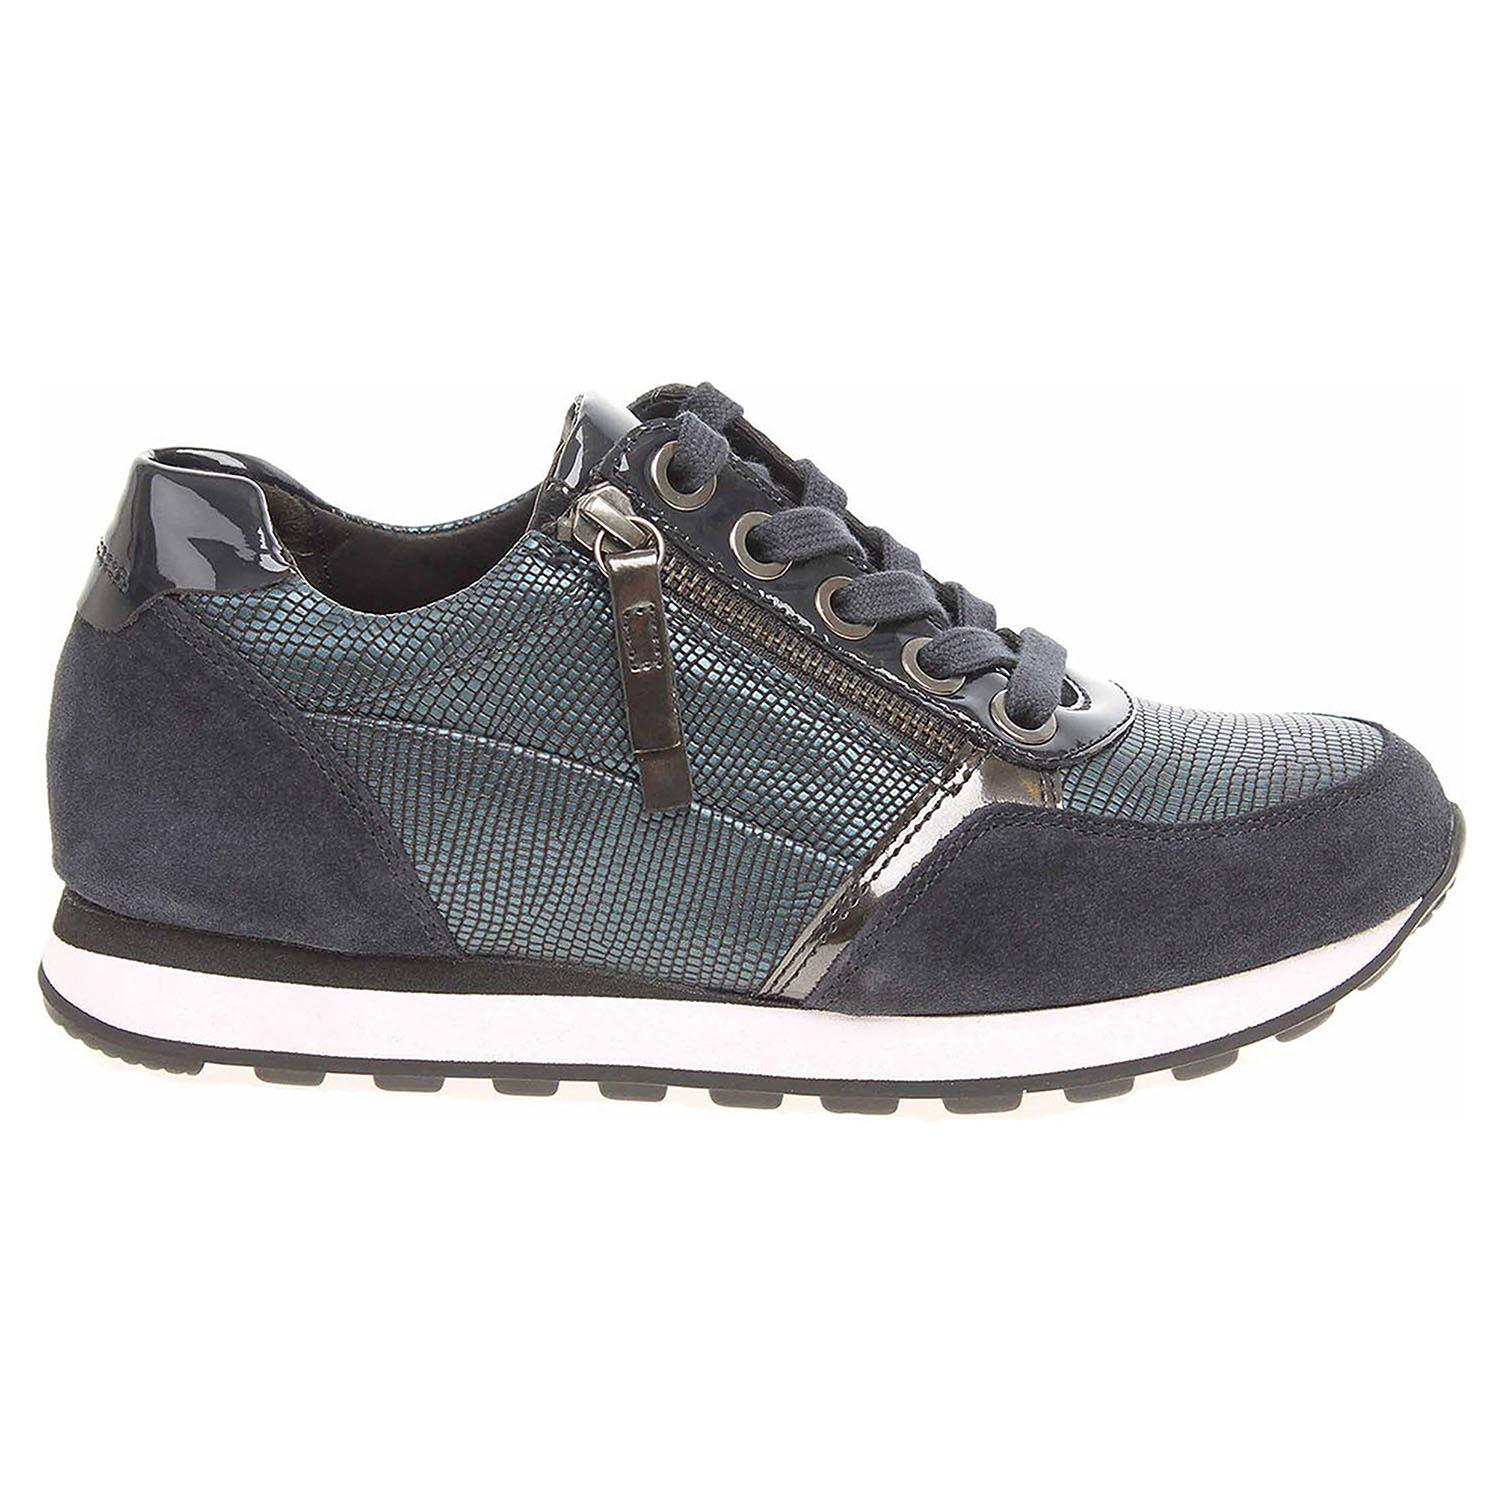 Ecco Gabor dámská obuv 76.335.36 modrá 23200724